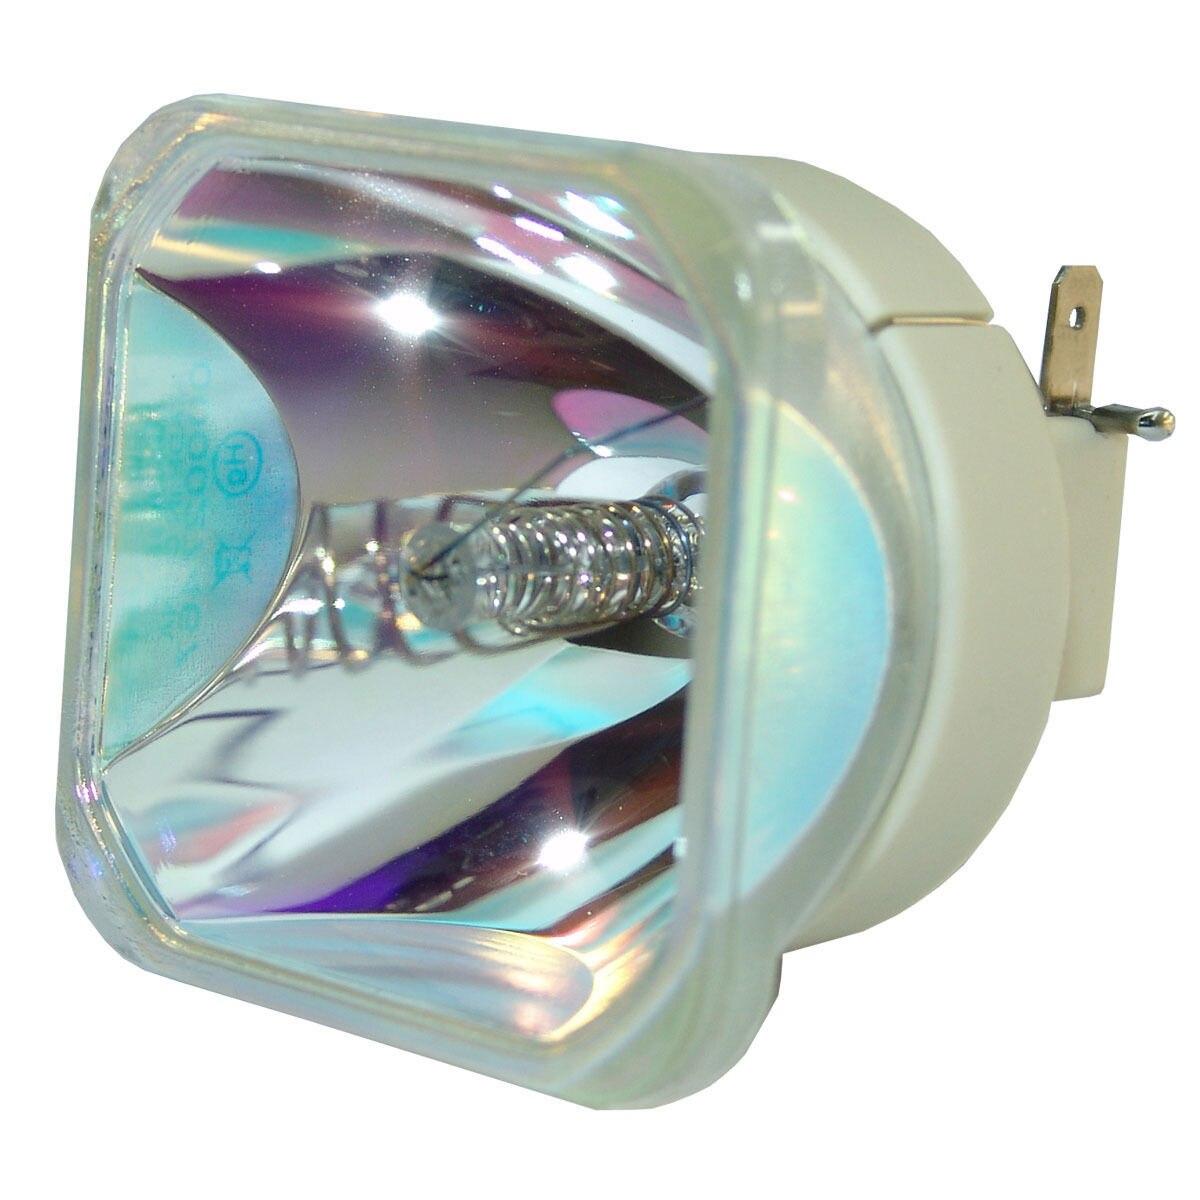 Compatible Bare Bulb LMP-C240 LMPC240 for Sony VPL-CW255 VPL-CX235 VPL-CX238 VPL-CW258 Projector Bulb Lamp without housing  lmp c240 original bare projector lamp for sony vpl cw255 vpl cx235 vpl cw258 vpl cx238 projectors